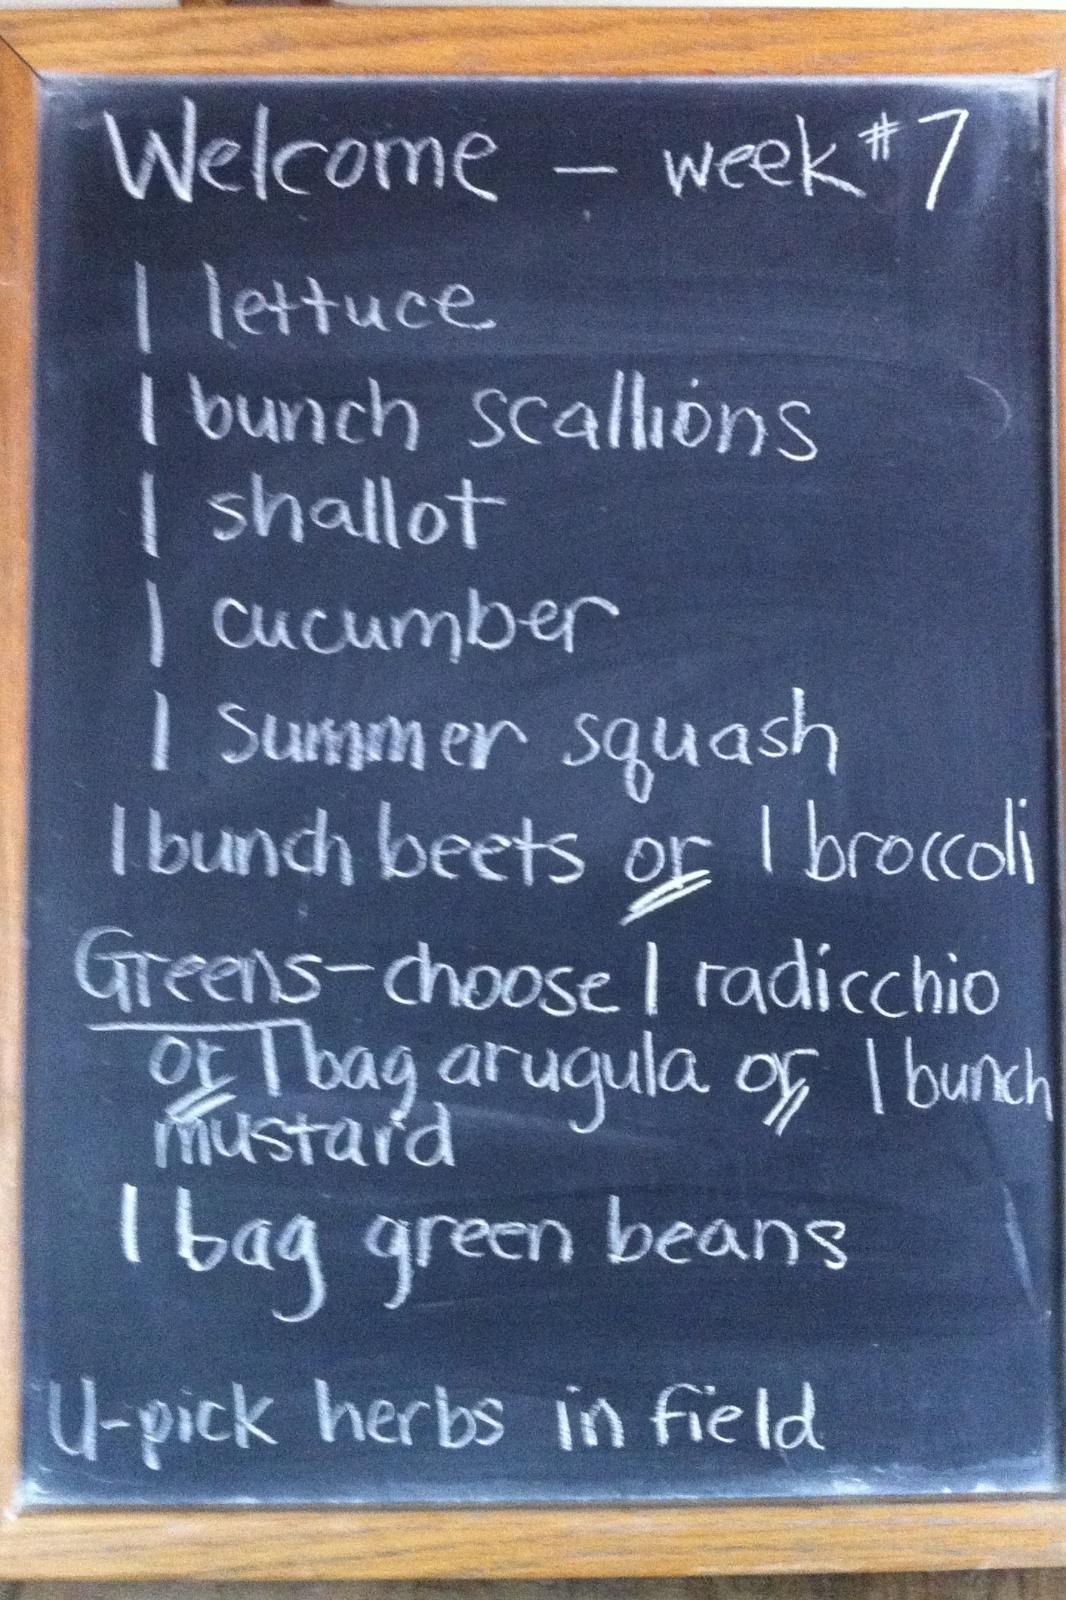 http://blog.rickk.com/food/2012/07/18/csa7.2.jpg